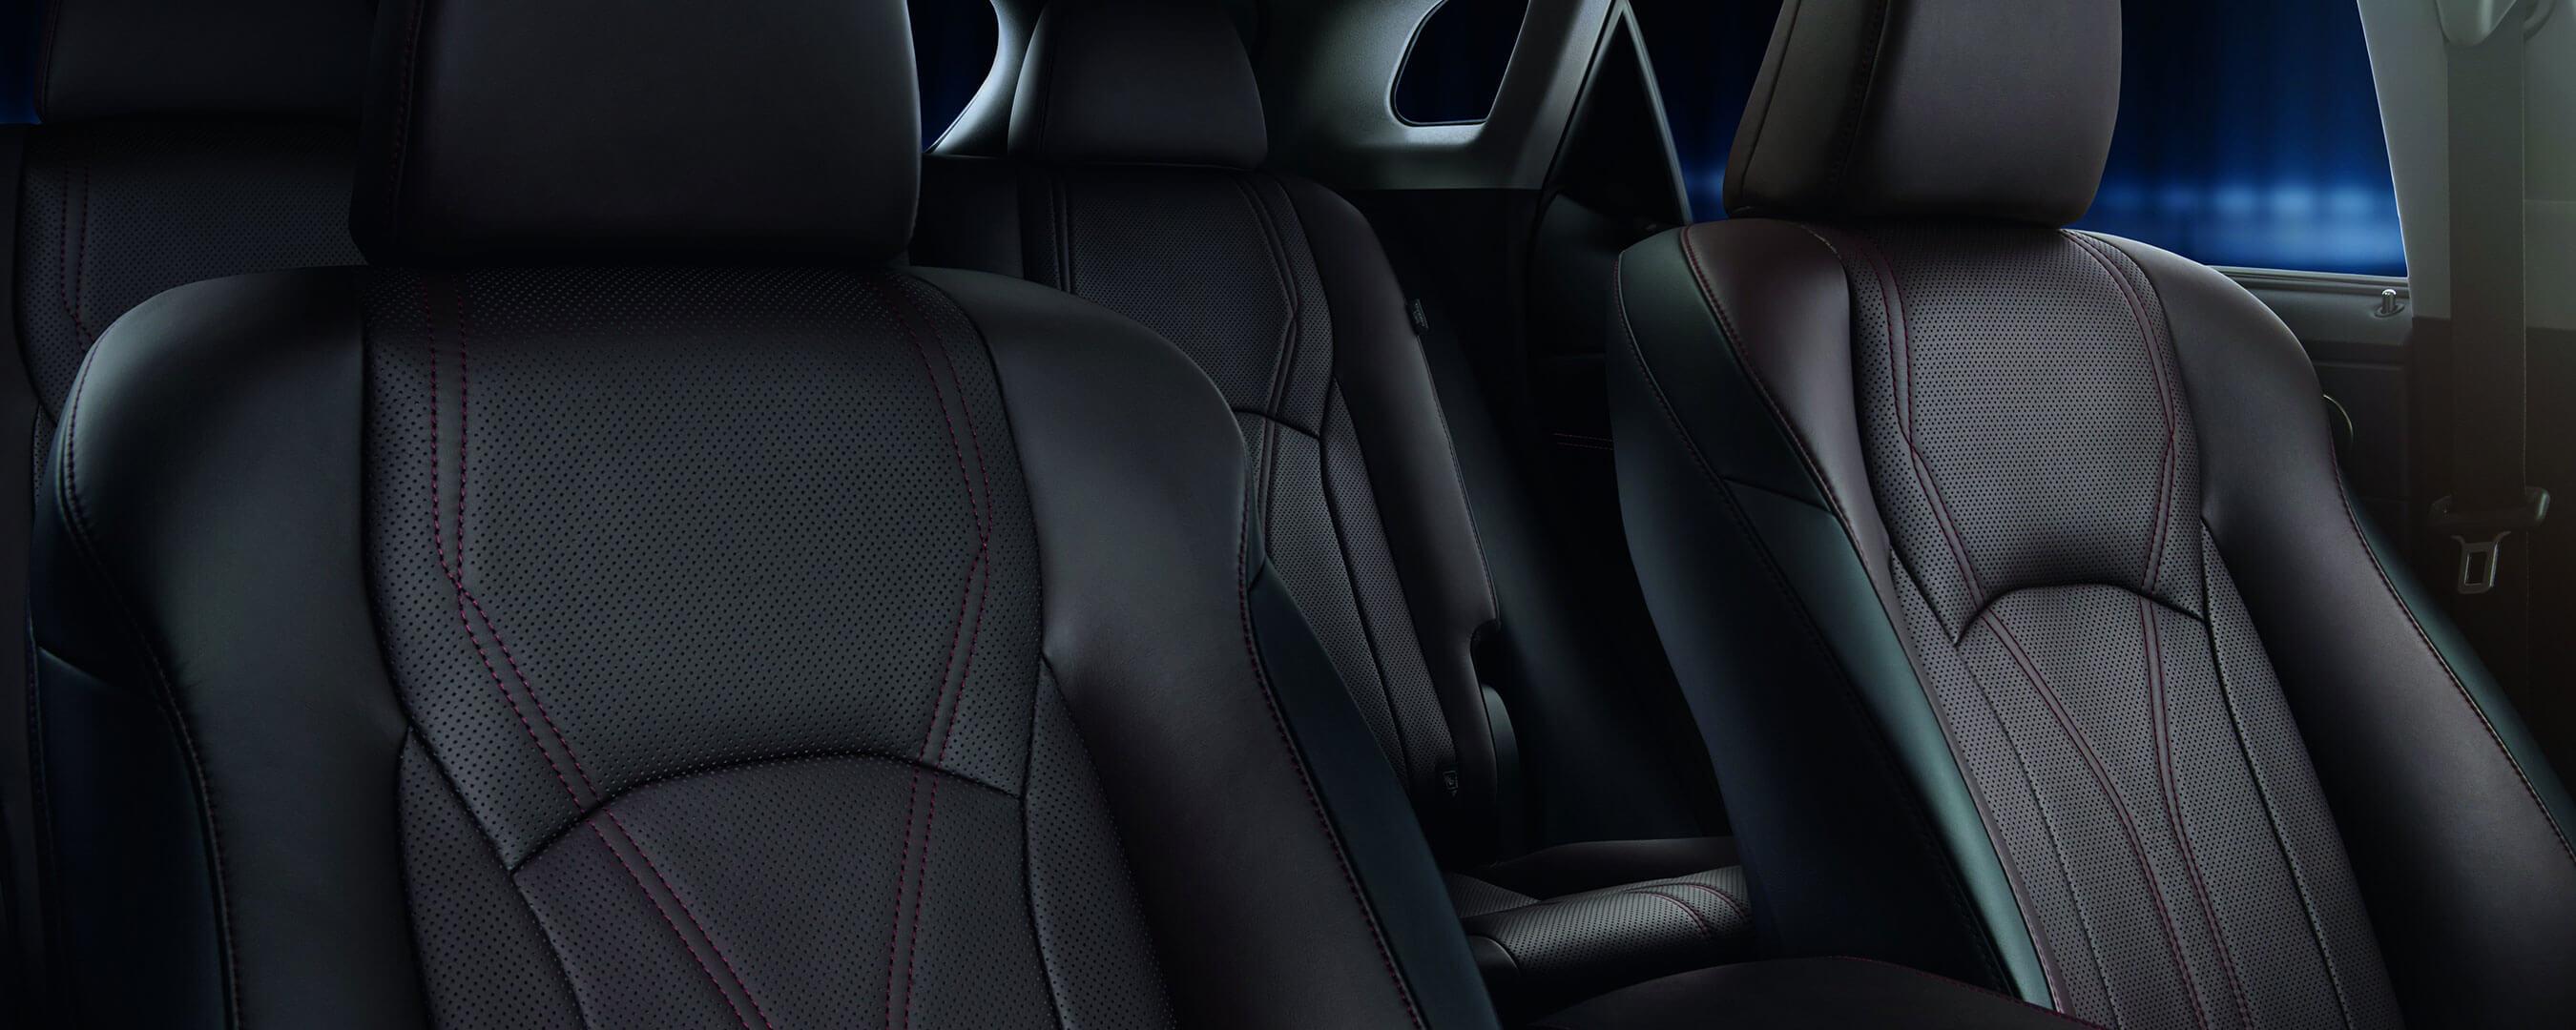 2017 lexus rx 450h experience interior back